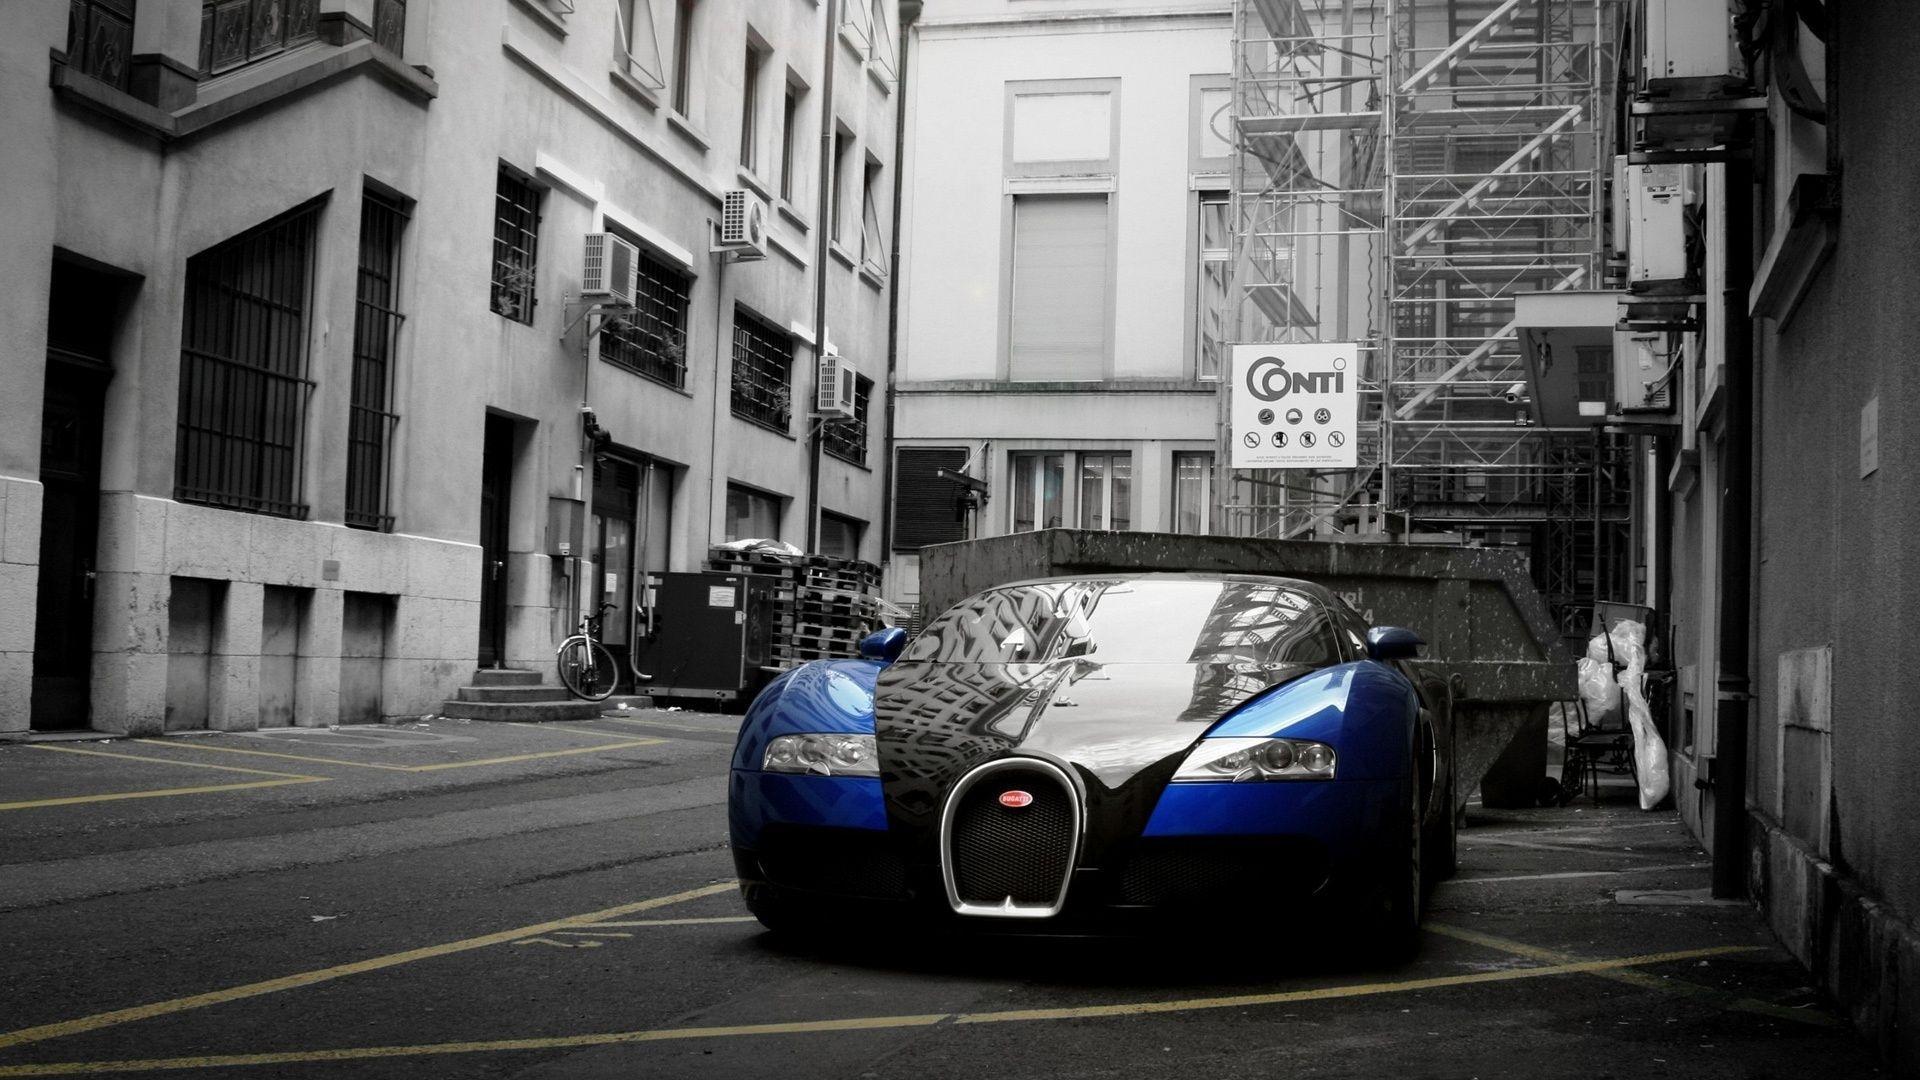 wallpapers for bugatti veyron wallpaper 2012 - Bugatti Veyron Wallpaper